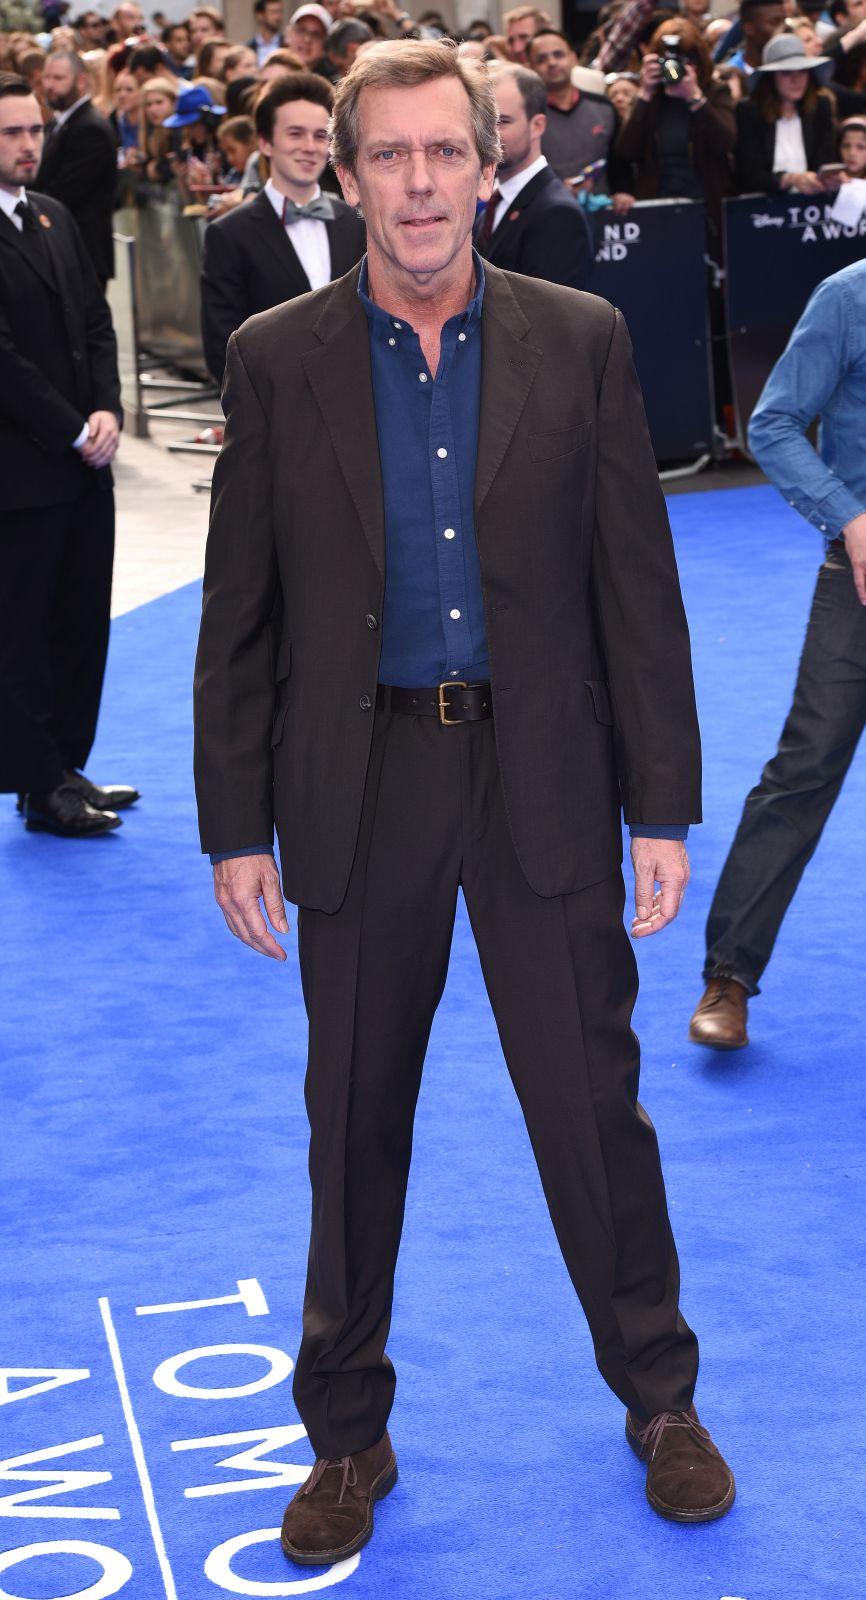 Hugh Laurie23 - Tomorrowland Premiere London 2015.jpg